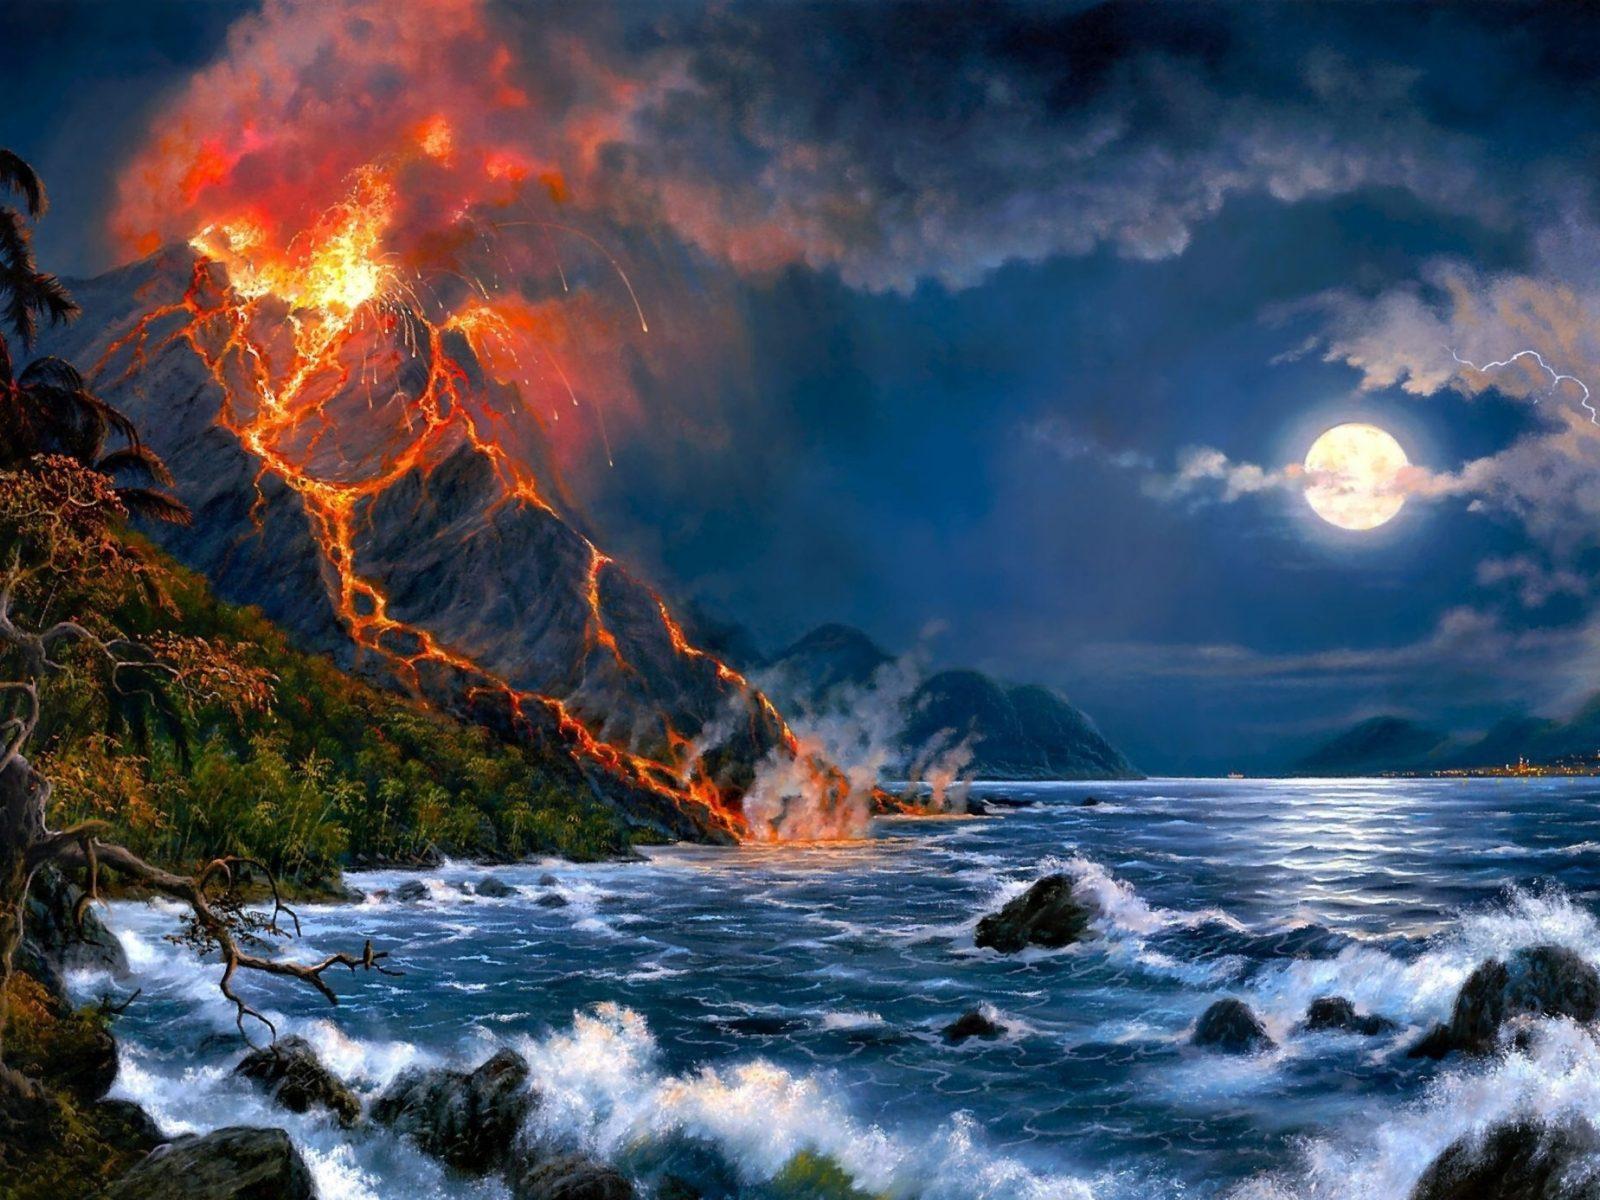 Fall Leaves Dancing Wallpaper Eruption Of Volcano Sea Full Moon Fantasy Art Hd Wallpaper